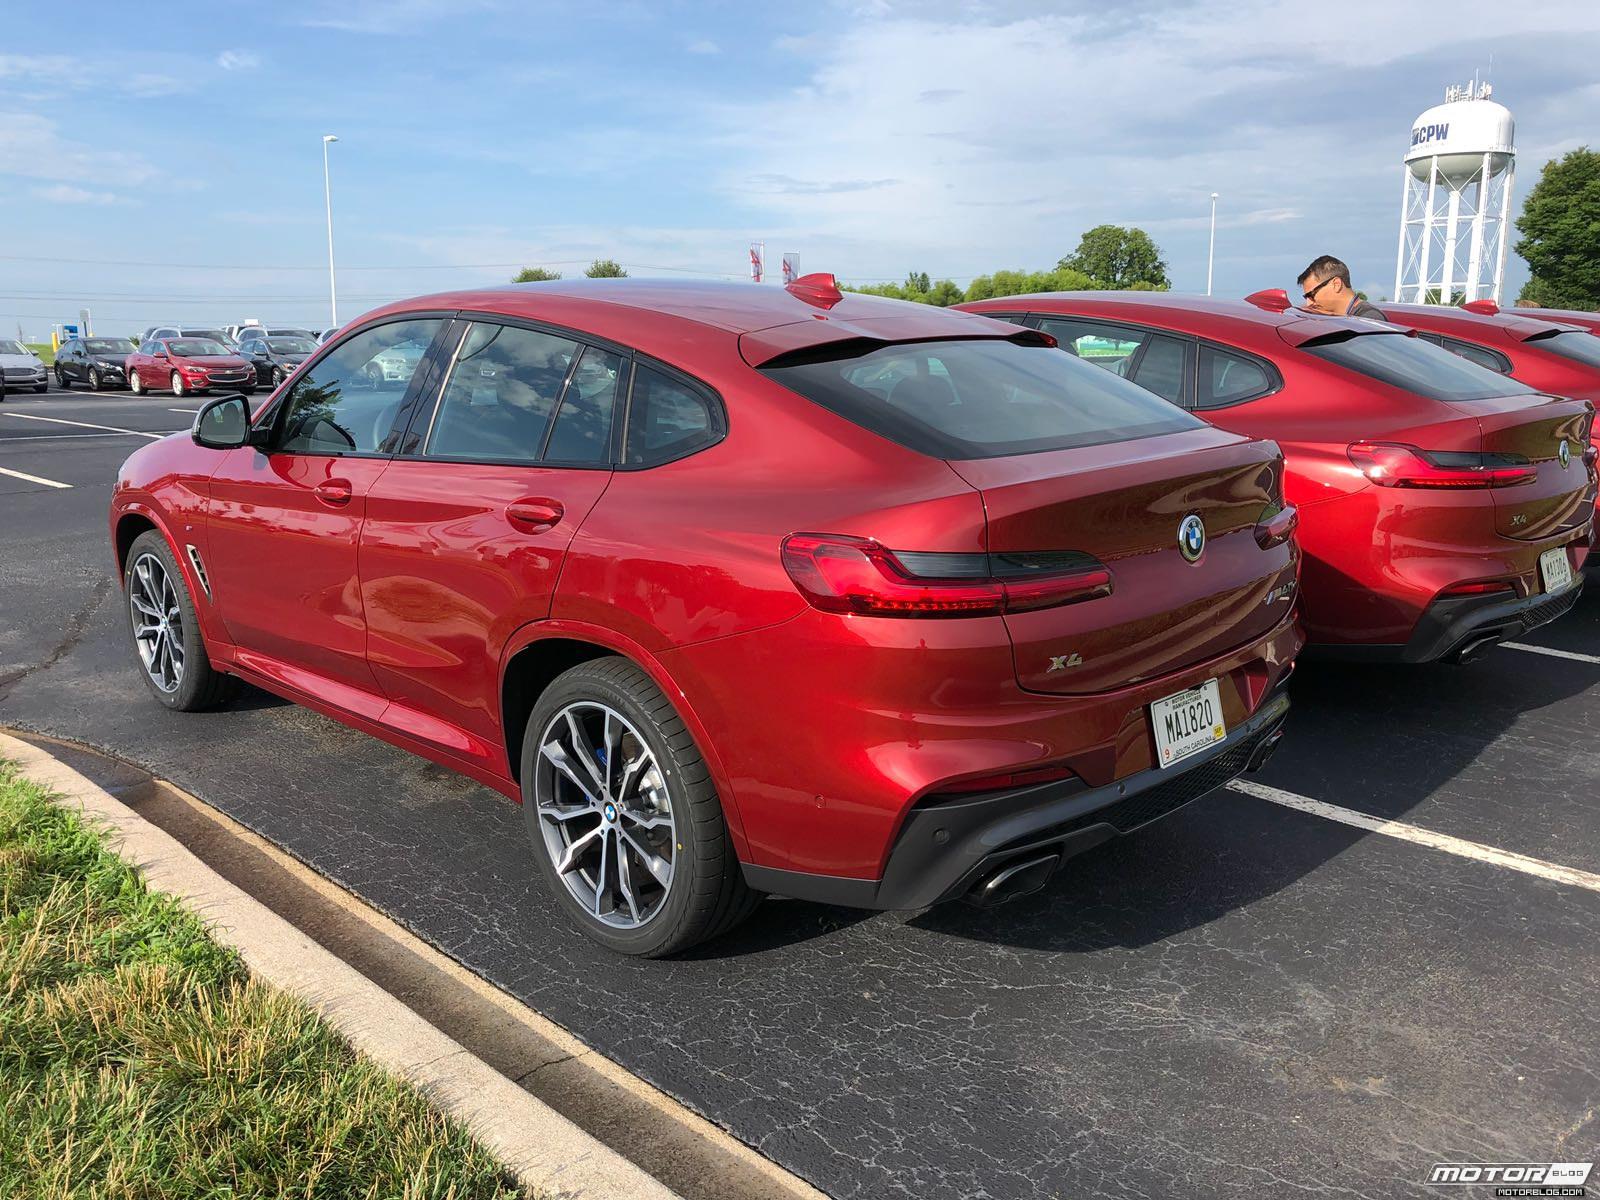 BMW x4 2018 Premiere Spartanburg media event 9